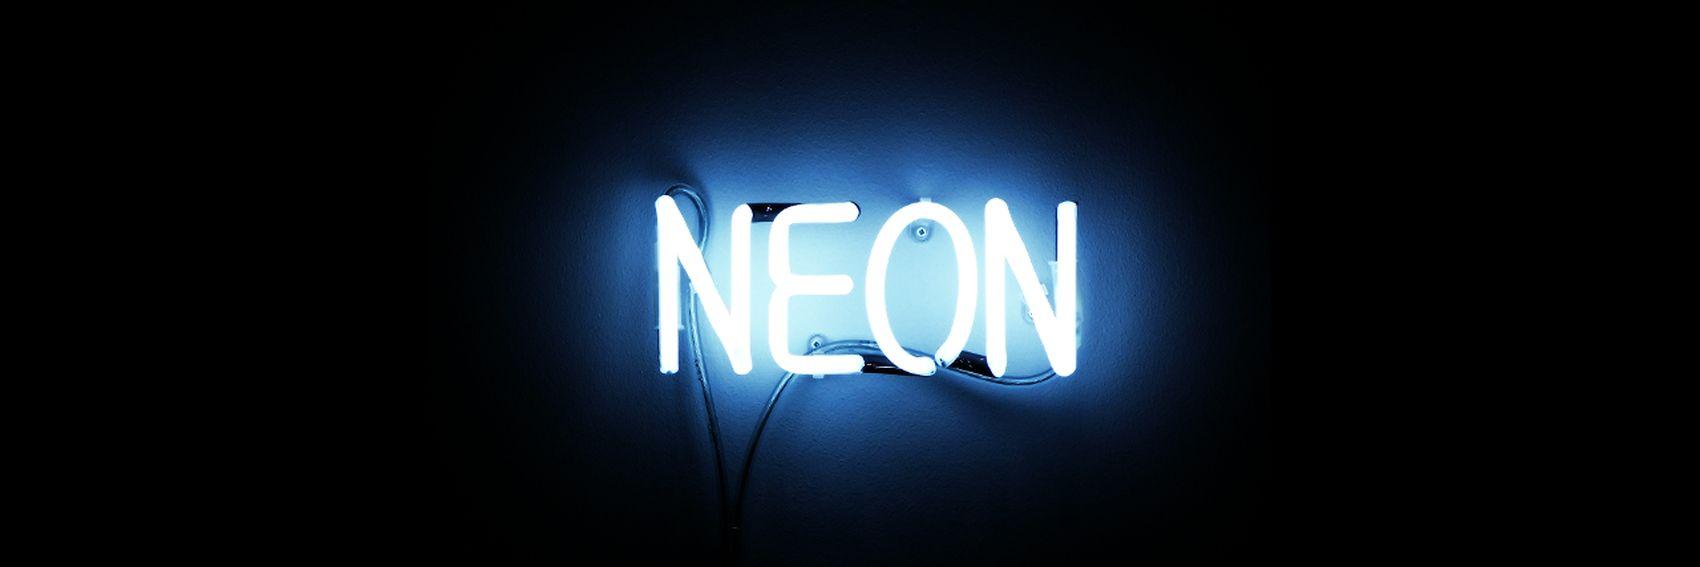 Cuz baby we will bright up like NEON LIGHTS Neon Lights Neonlights Neon Sign NeonParty Neons Neonblue First Eyeem Photo